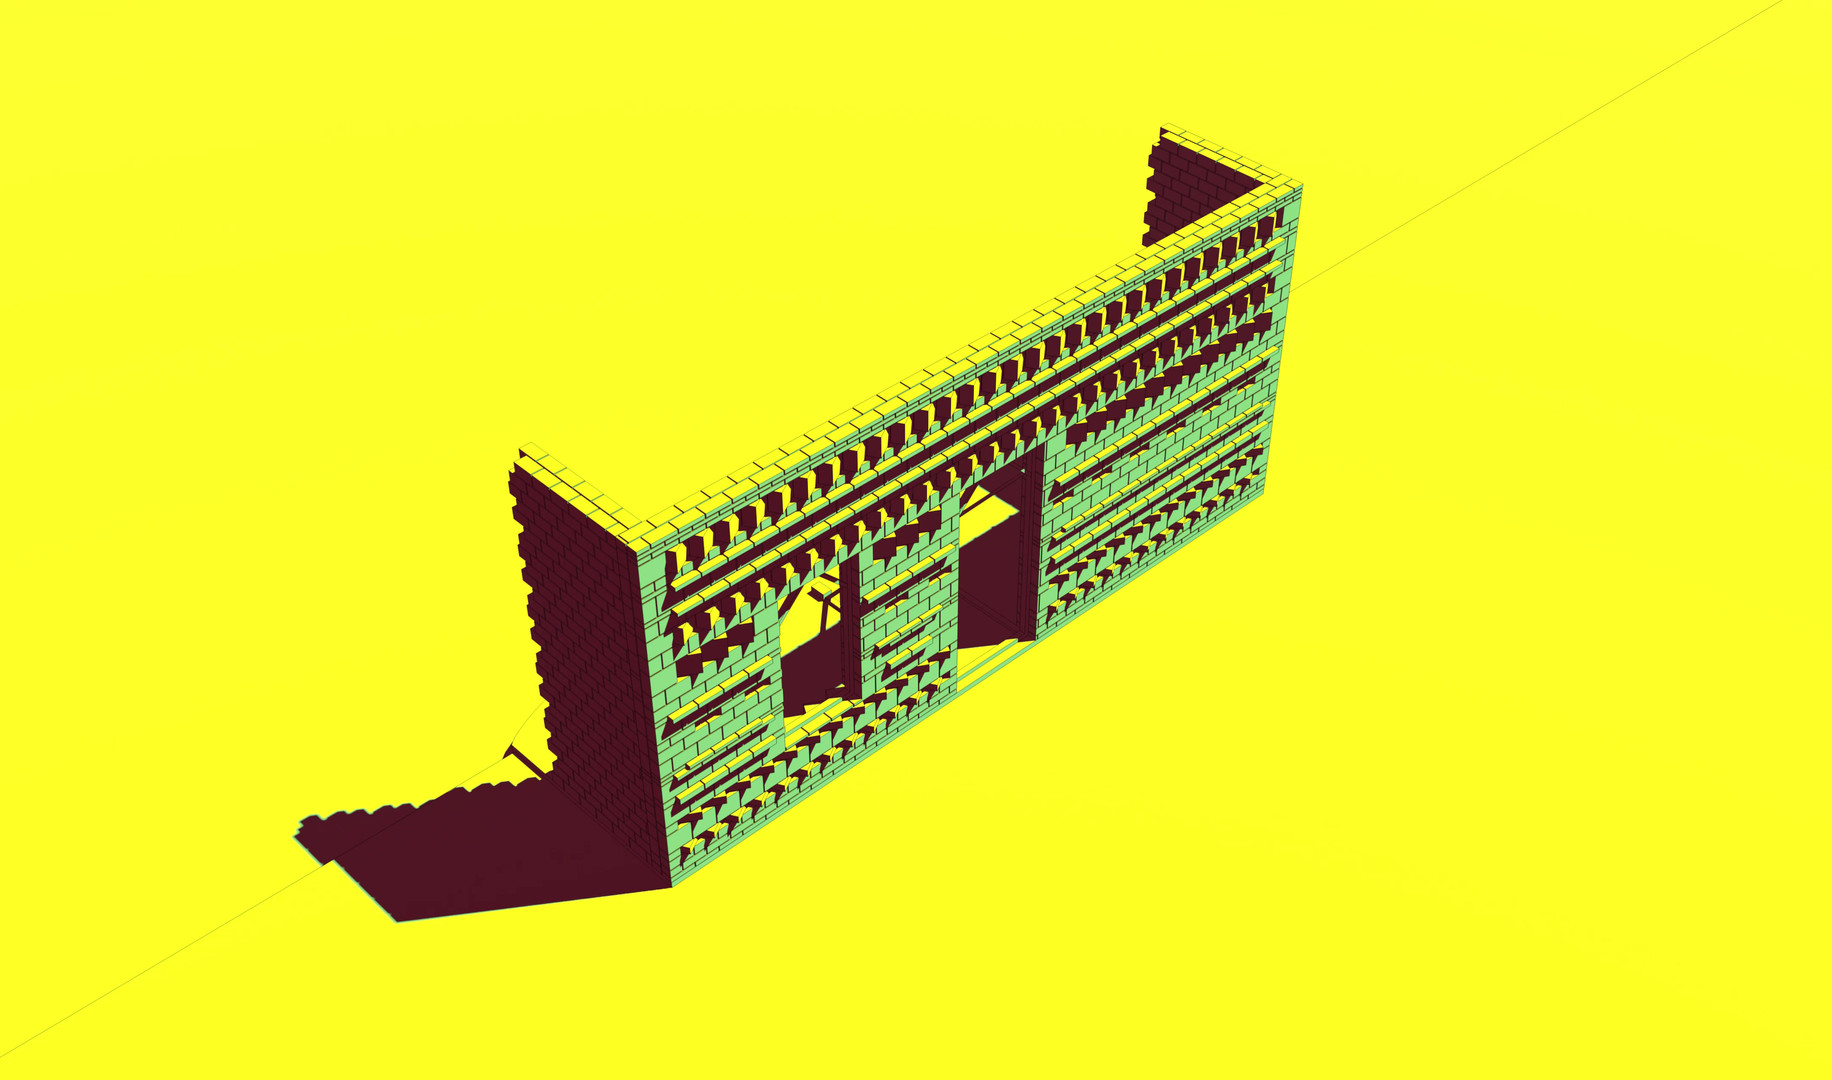 Karoo Farmhouse_Generative Brick Walls.m